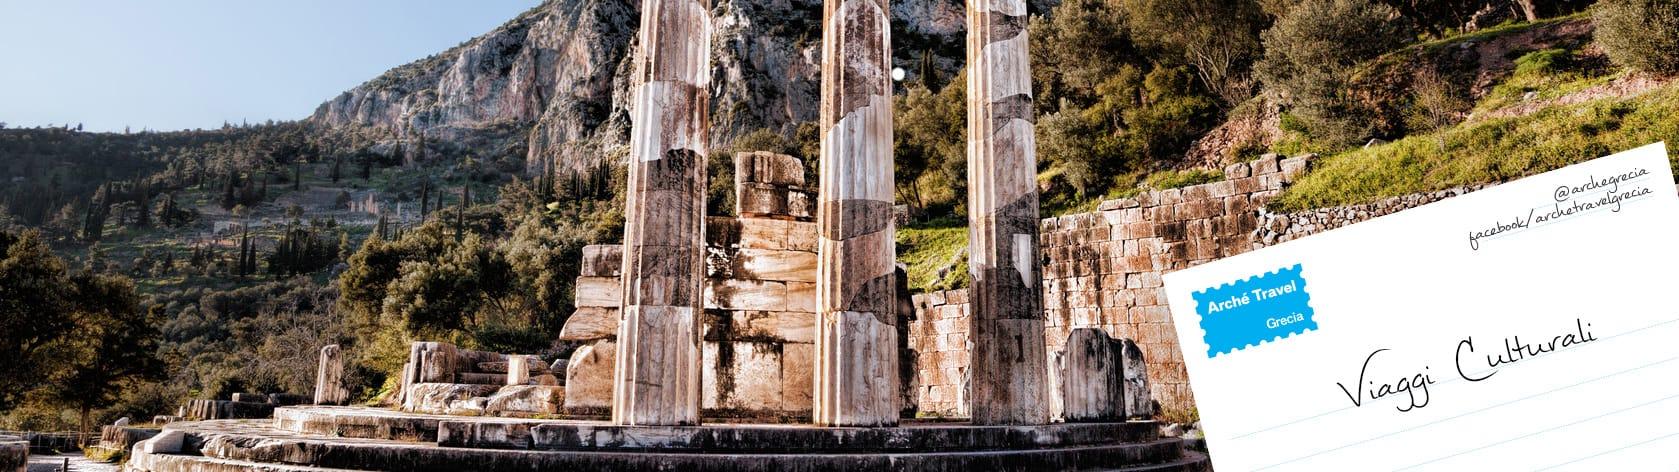 Viaggi Culturali Grecia - Tour Grecia Culturali Archeologici - Arché Travel - Tour Operator Grecia